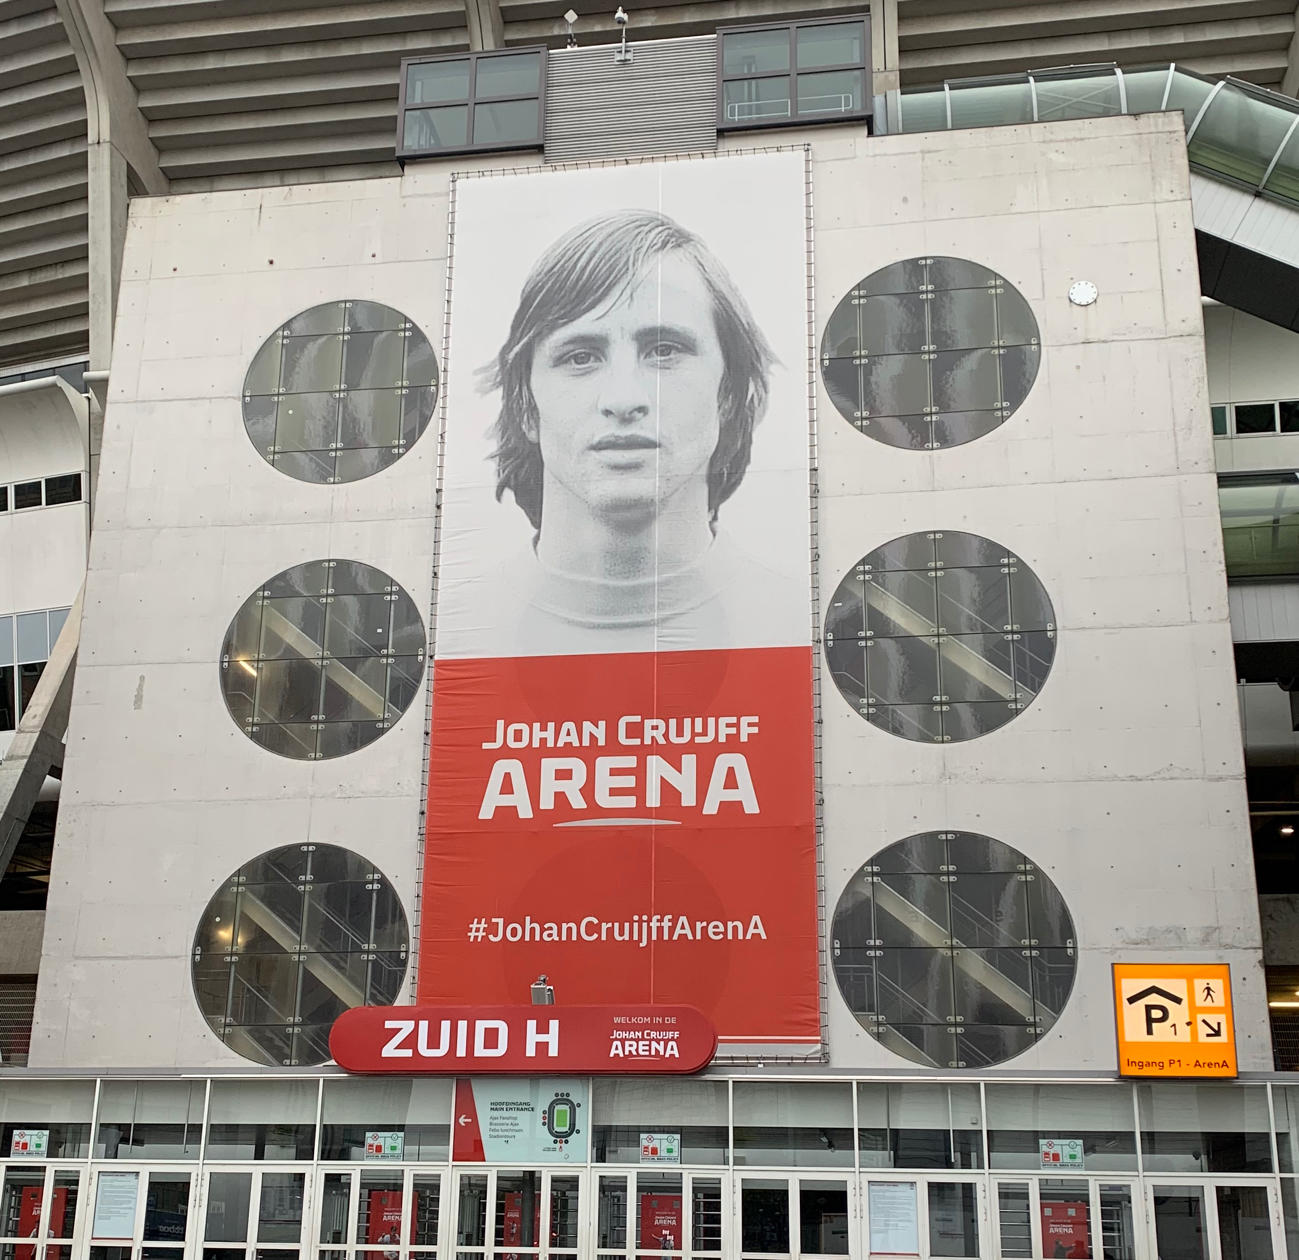 JC Arena